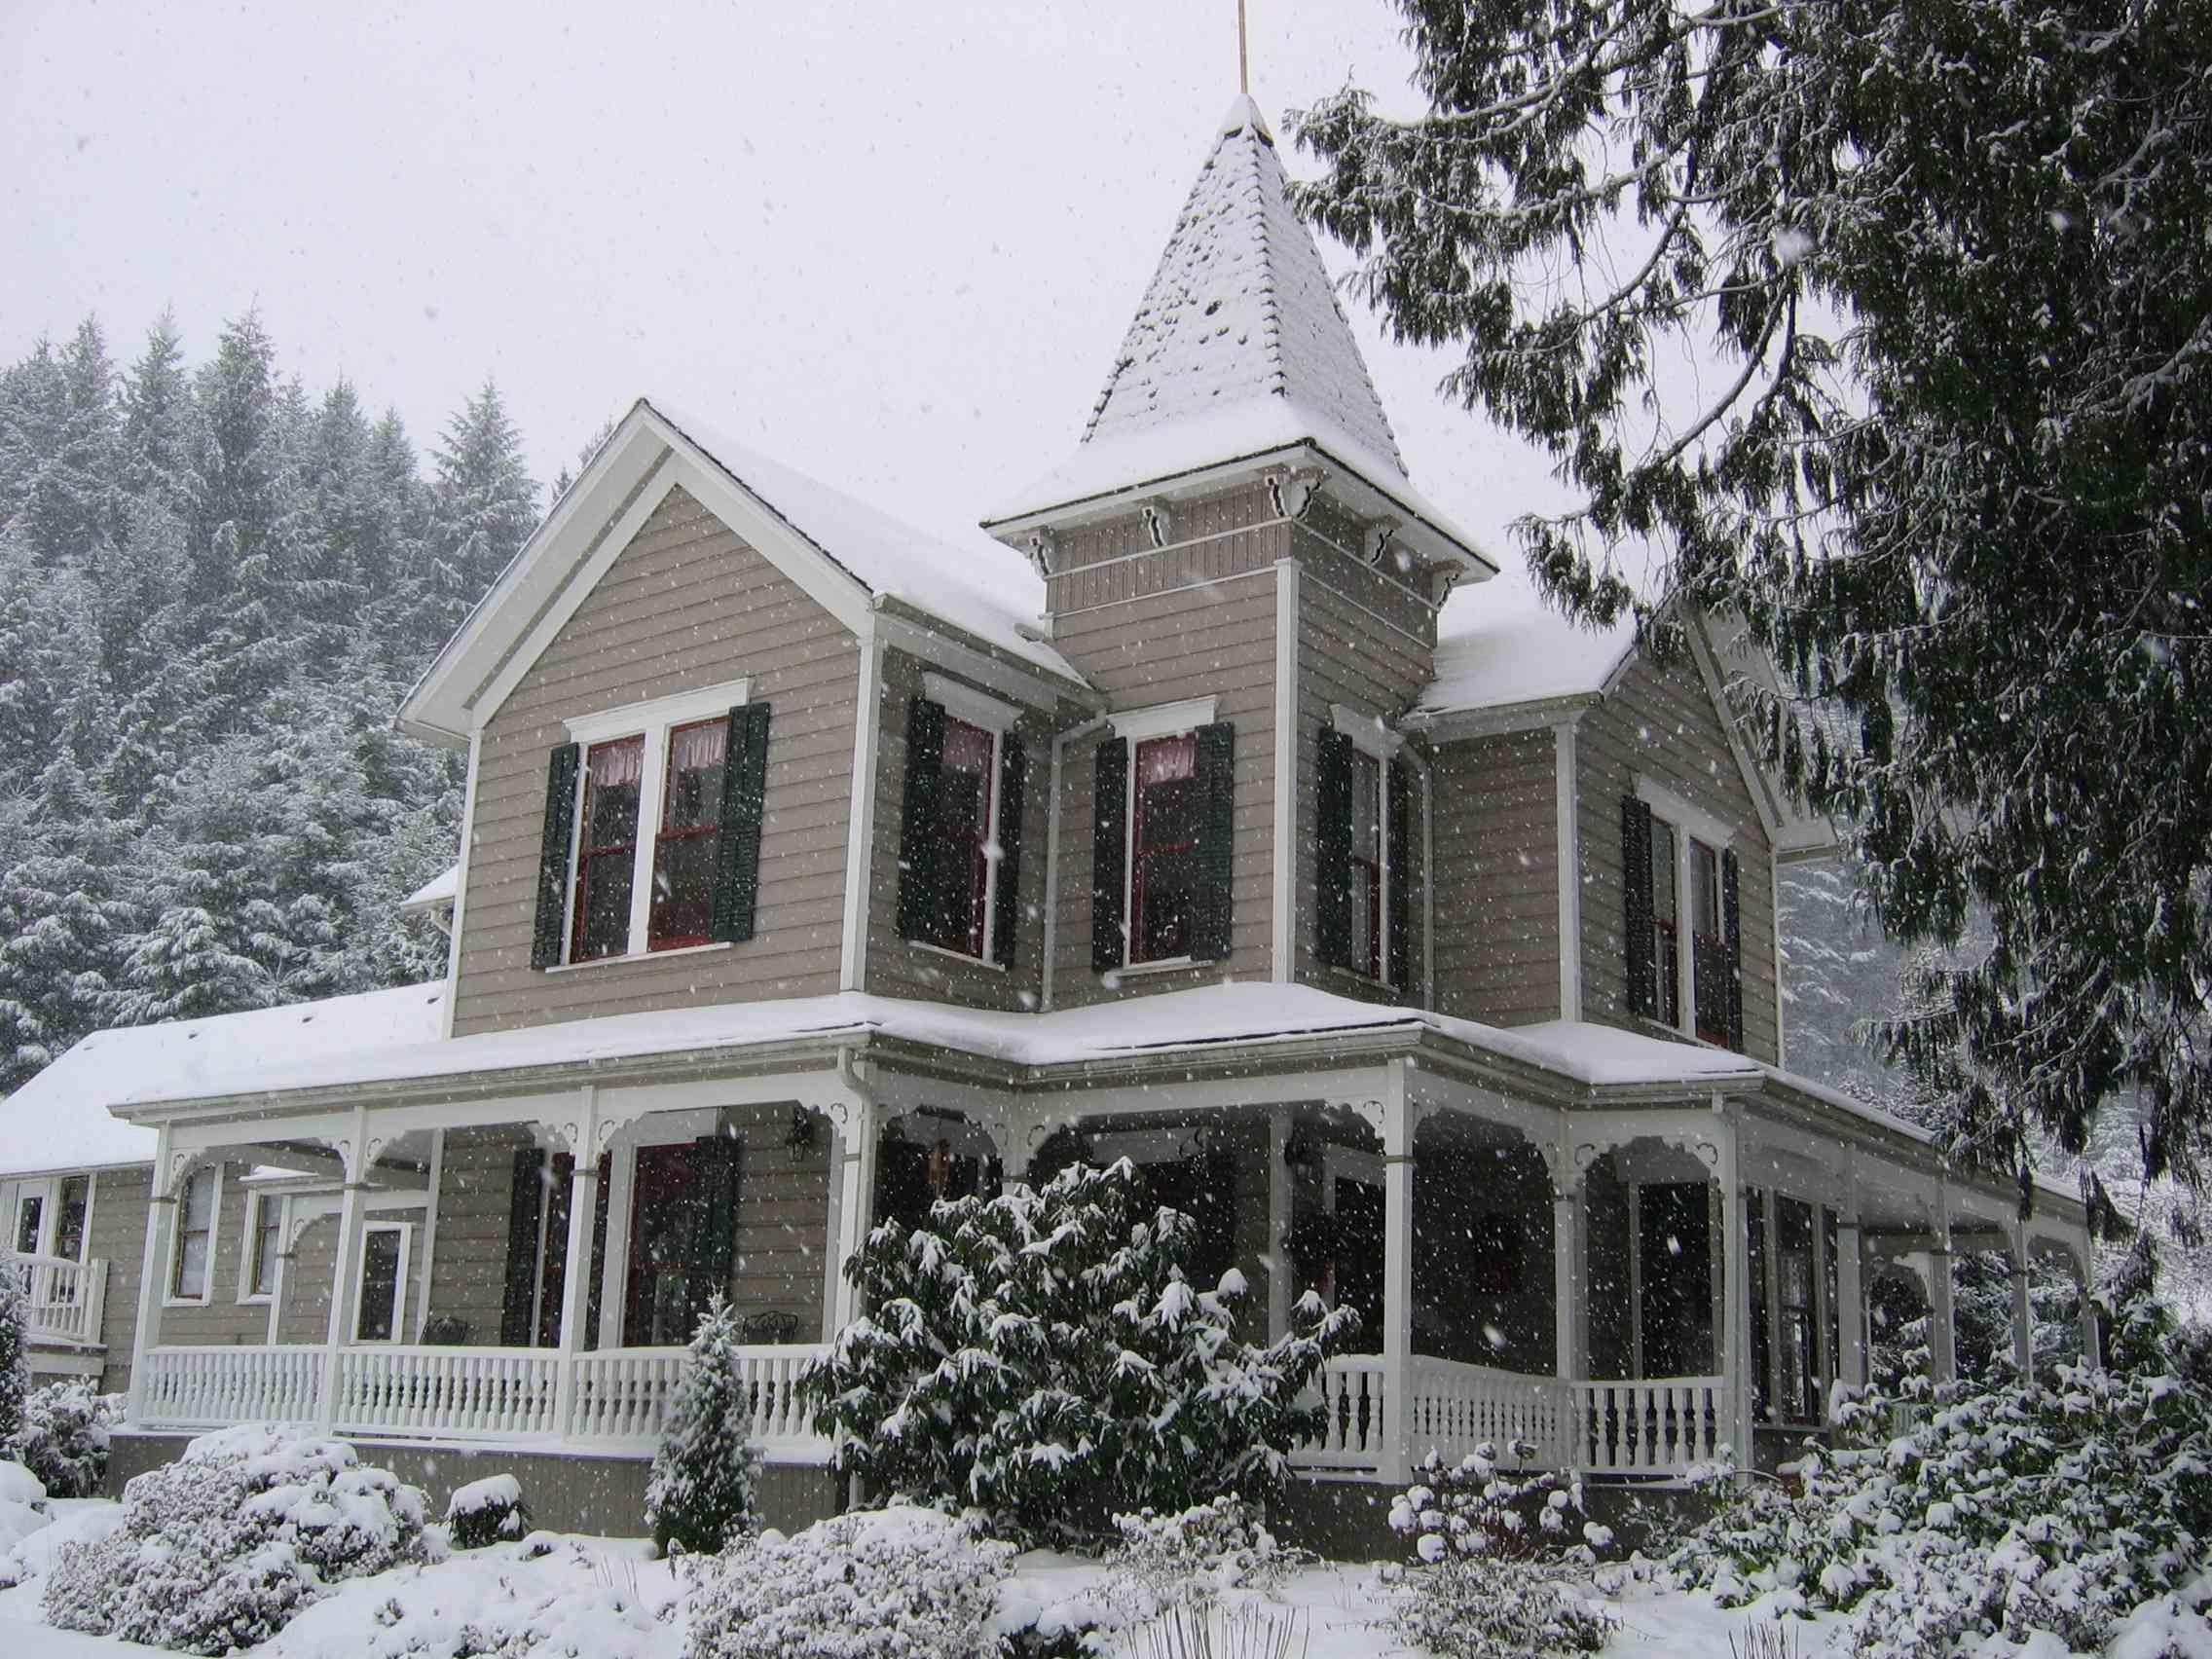 Queen Anne Victorian house in Oregon.